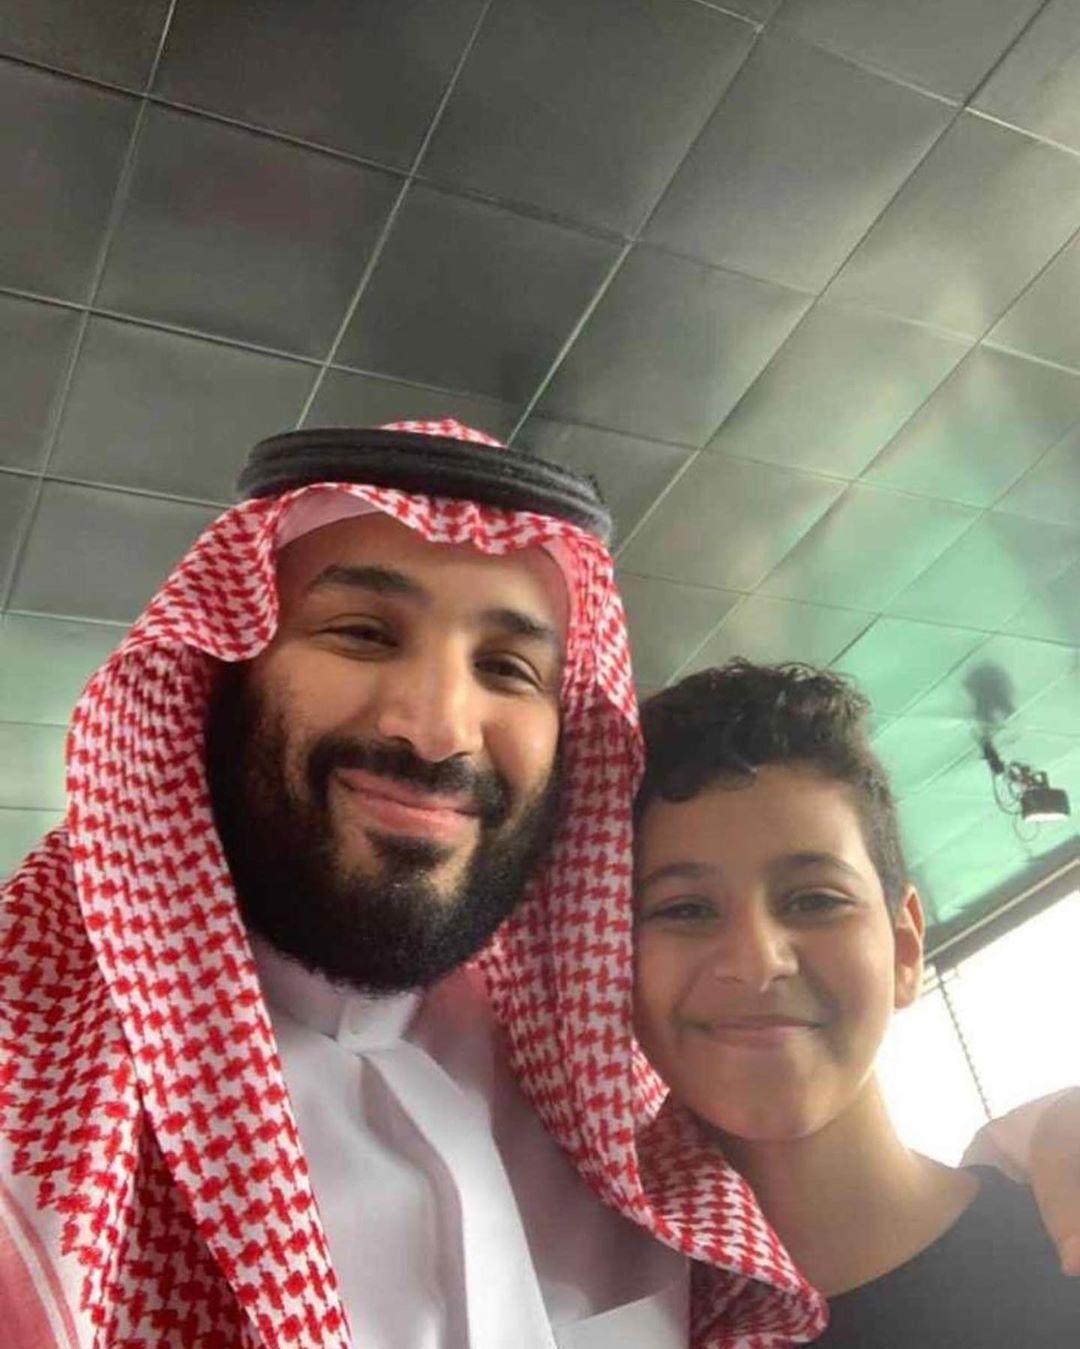 Pin By Rwmena On Bin Salman Jeddah Instagram Royal